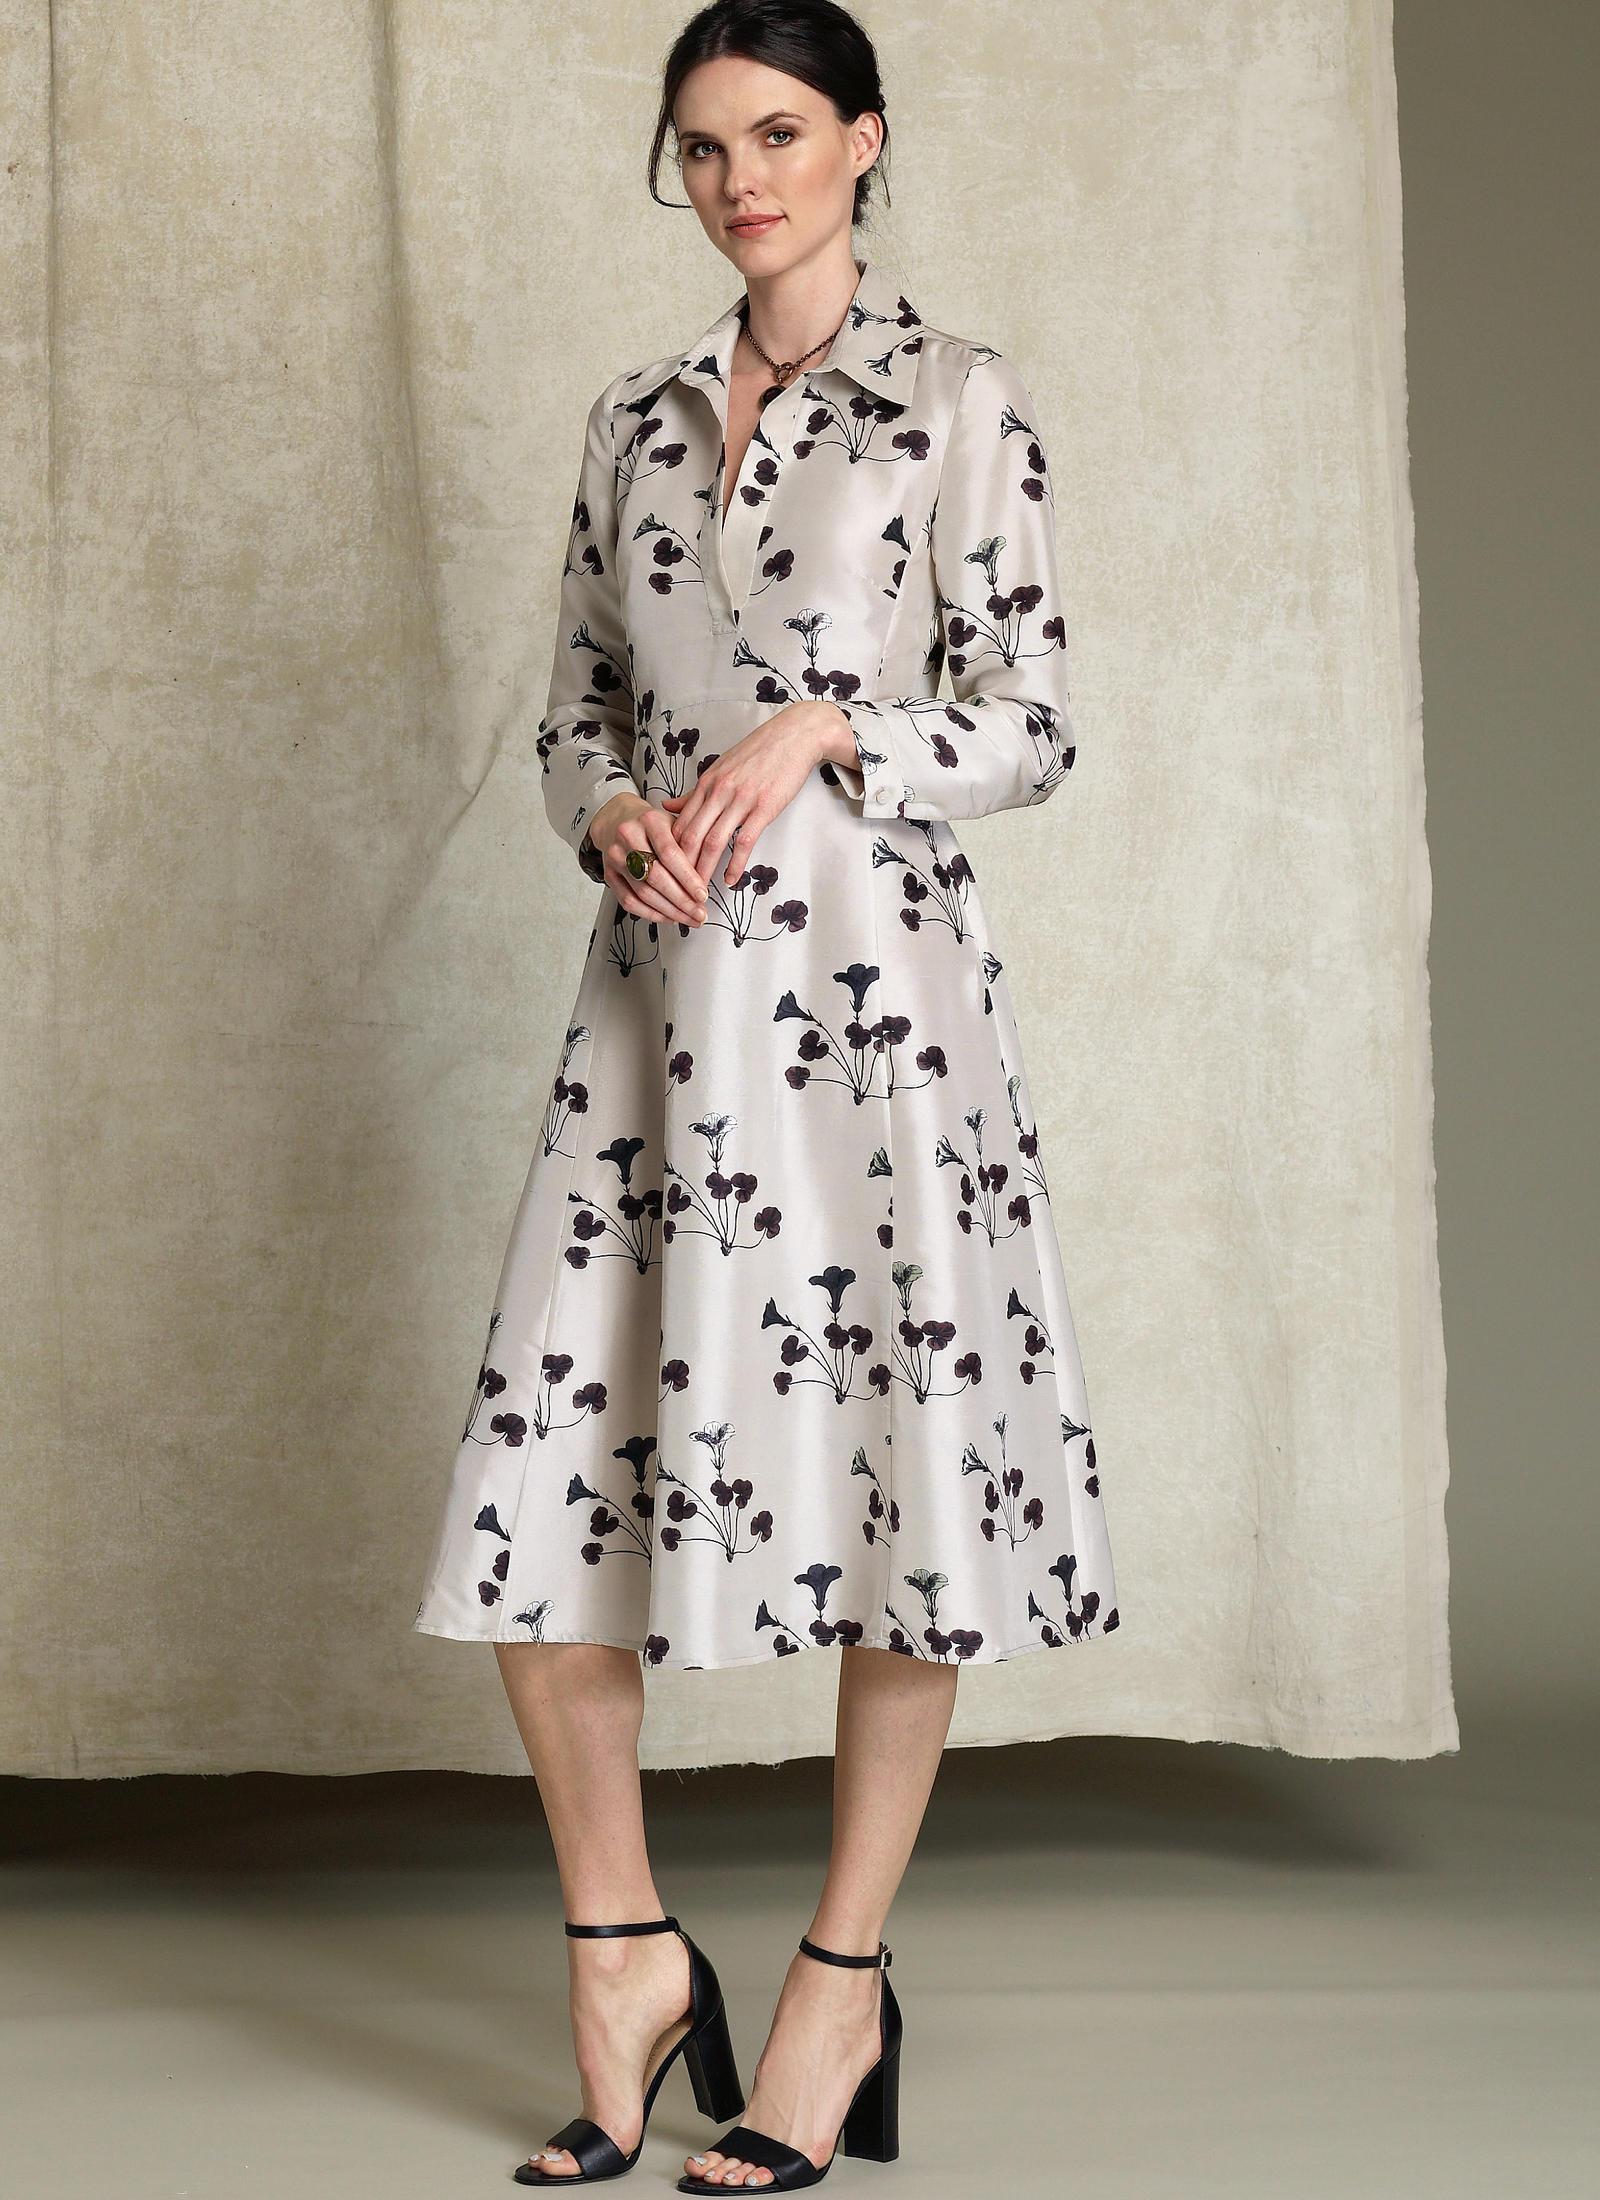 Vogue Patterns 1511 MISSES' HALF-PLACKET, LONG SLEEVE